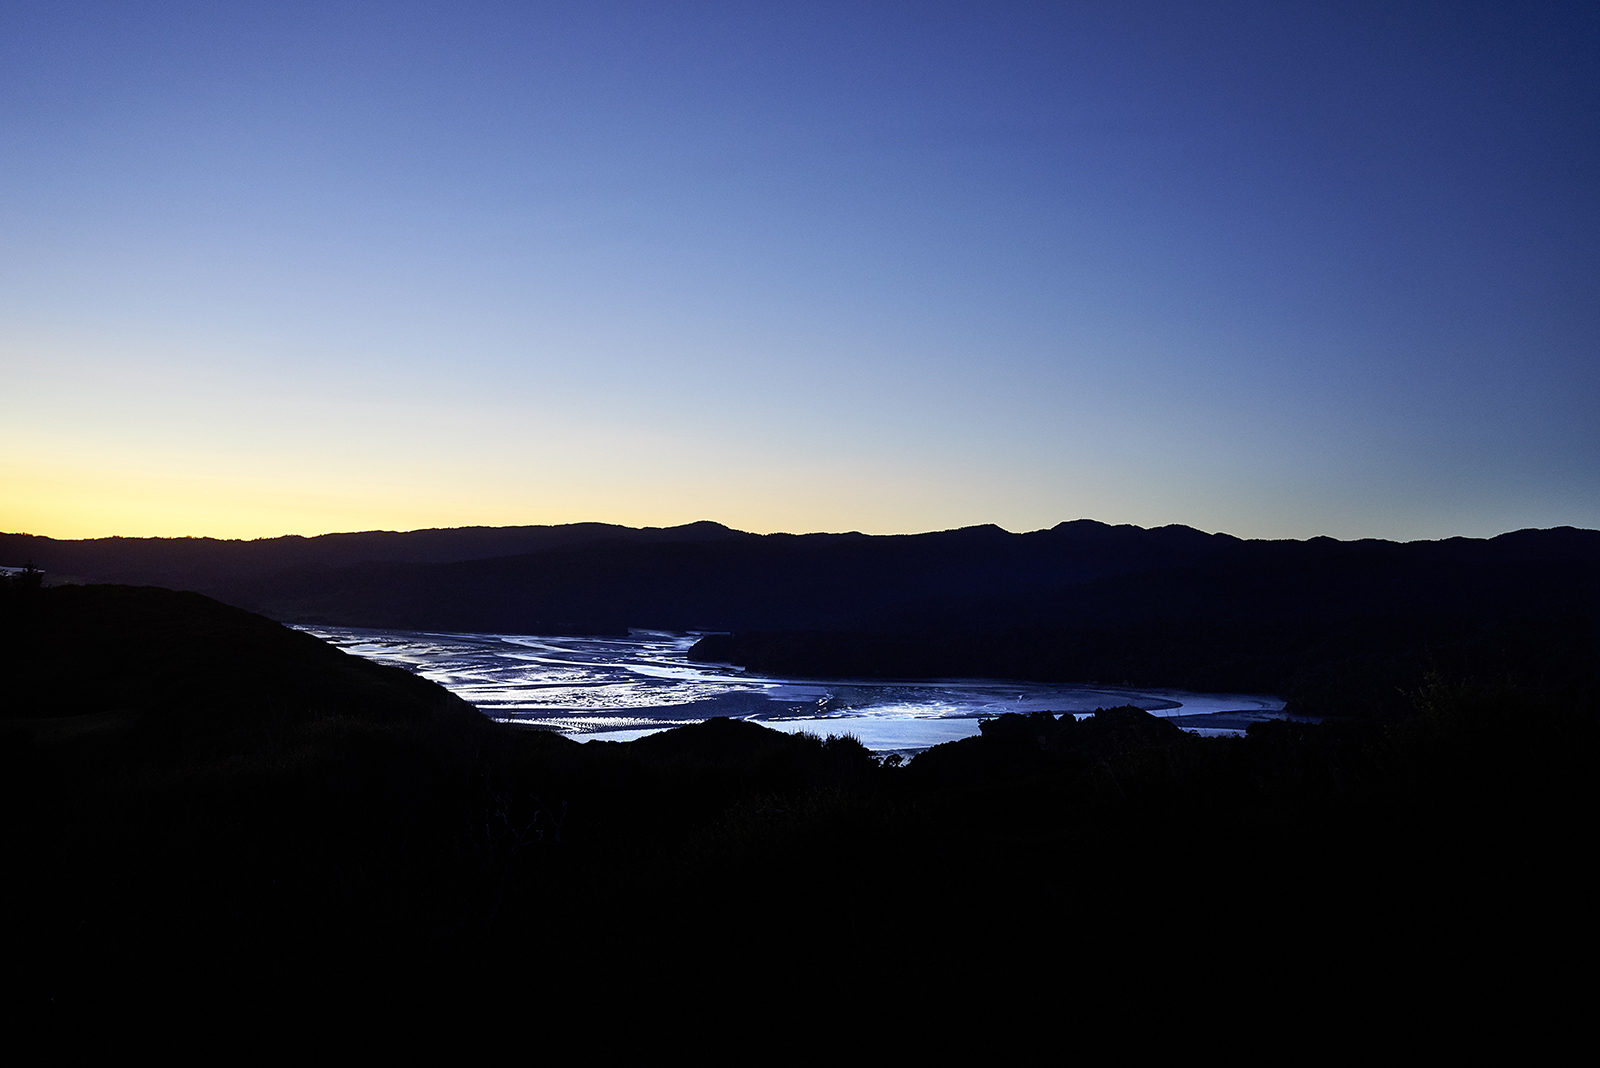 New_Zealand_Westhaven Luxury_Lodge.jpg